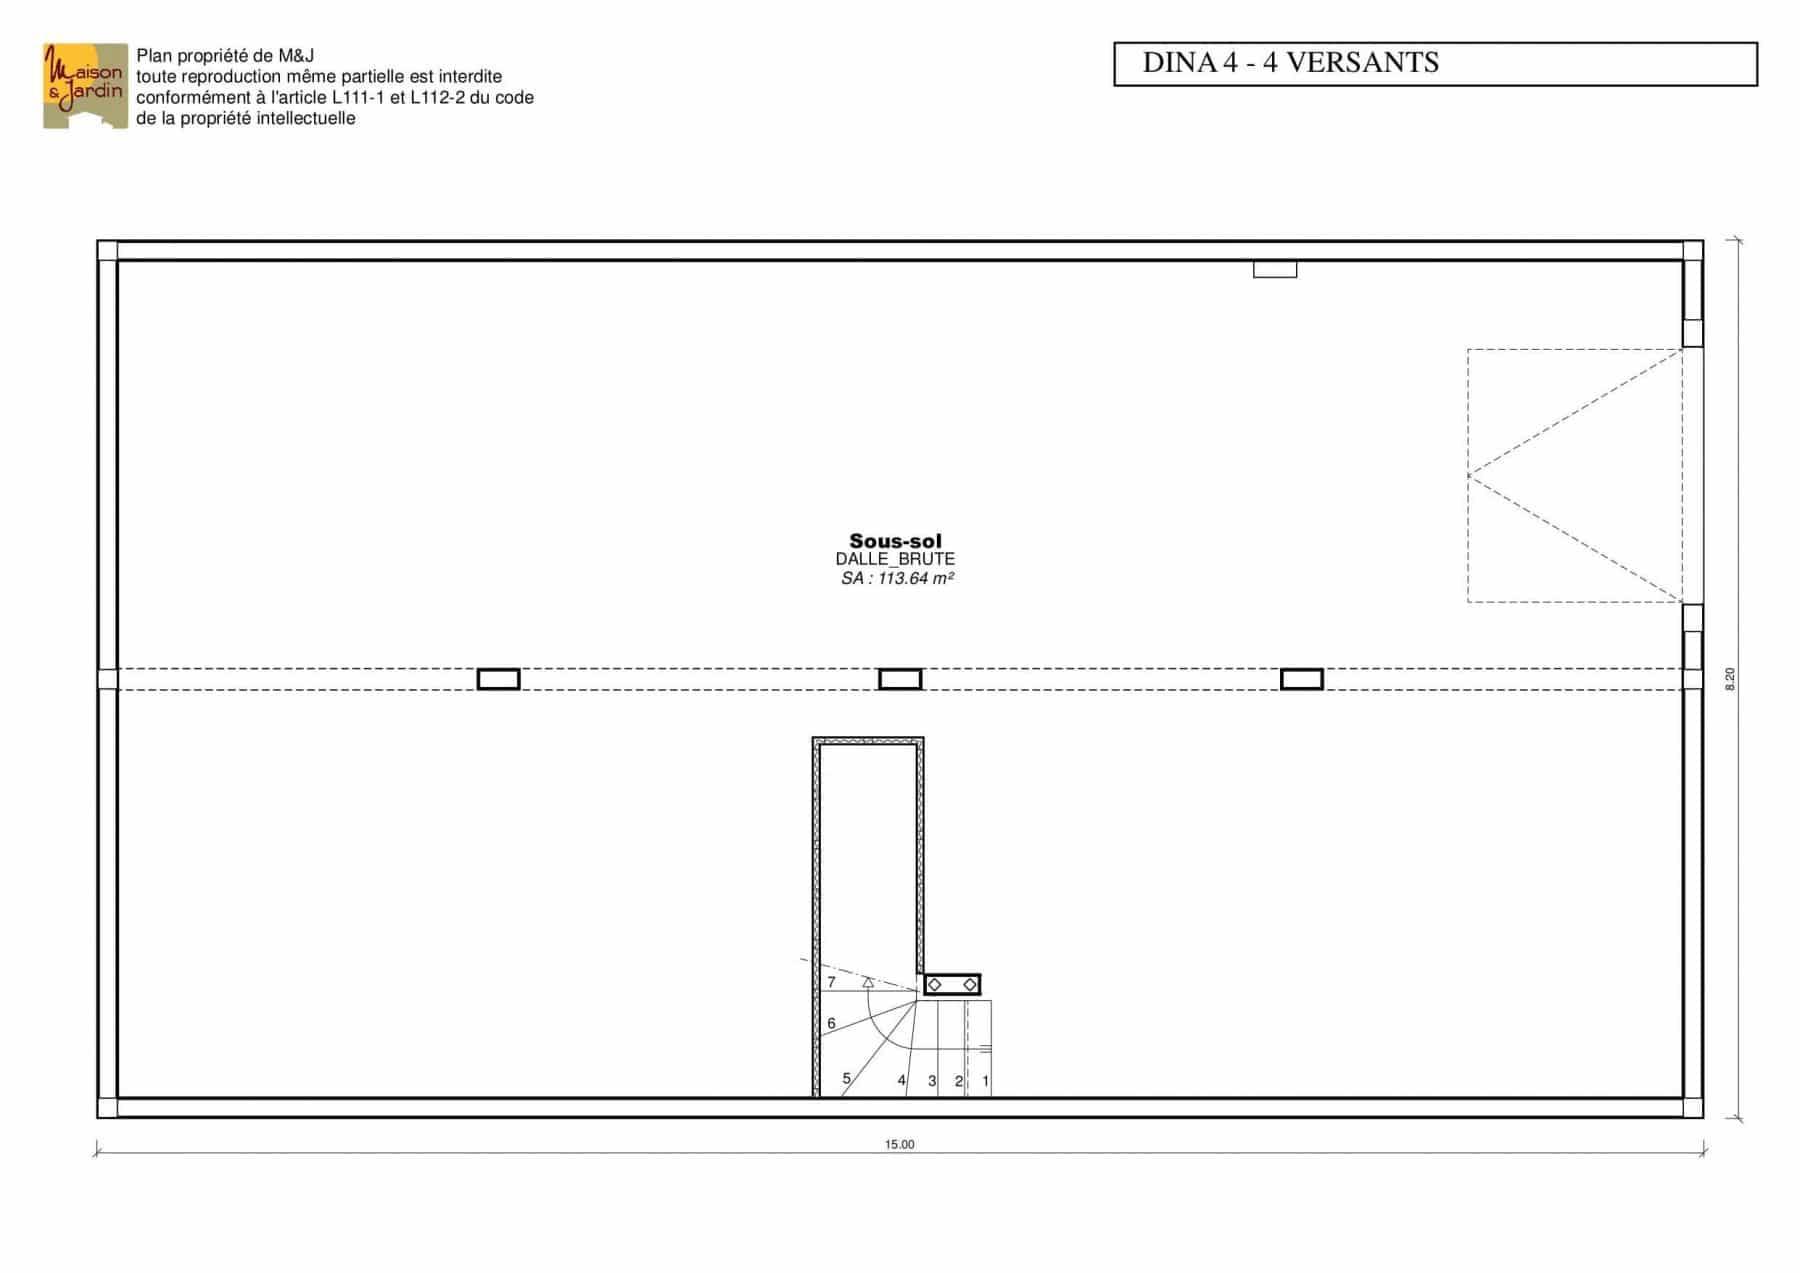 plan maison Dina101(4v)ssol sans cote